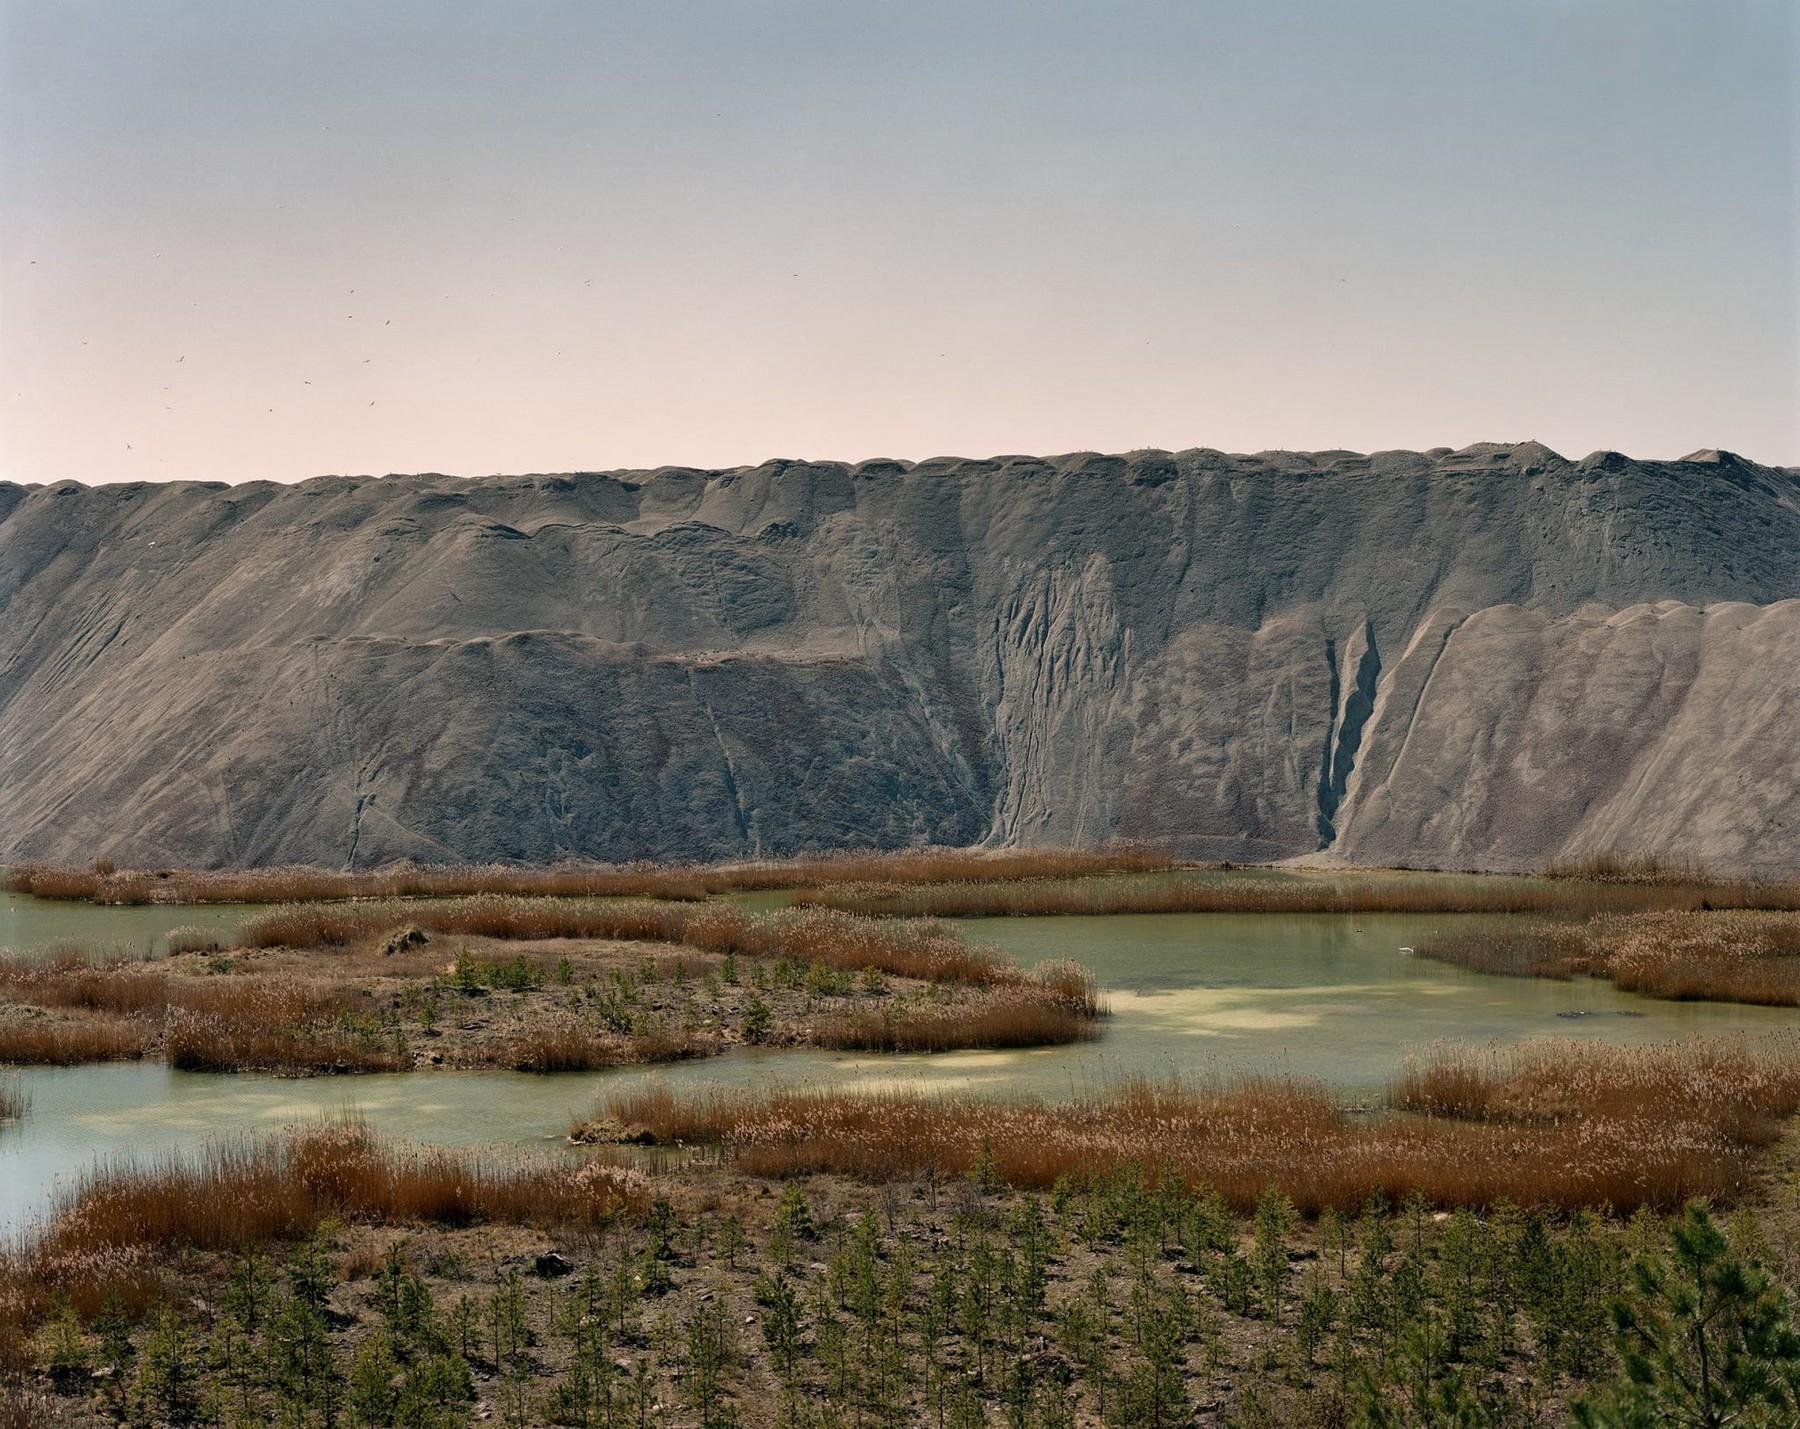 ignant-photography-felix-odell-landscapes-010-2048x1626.jpg